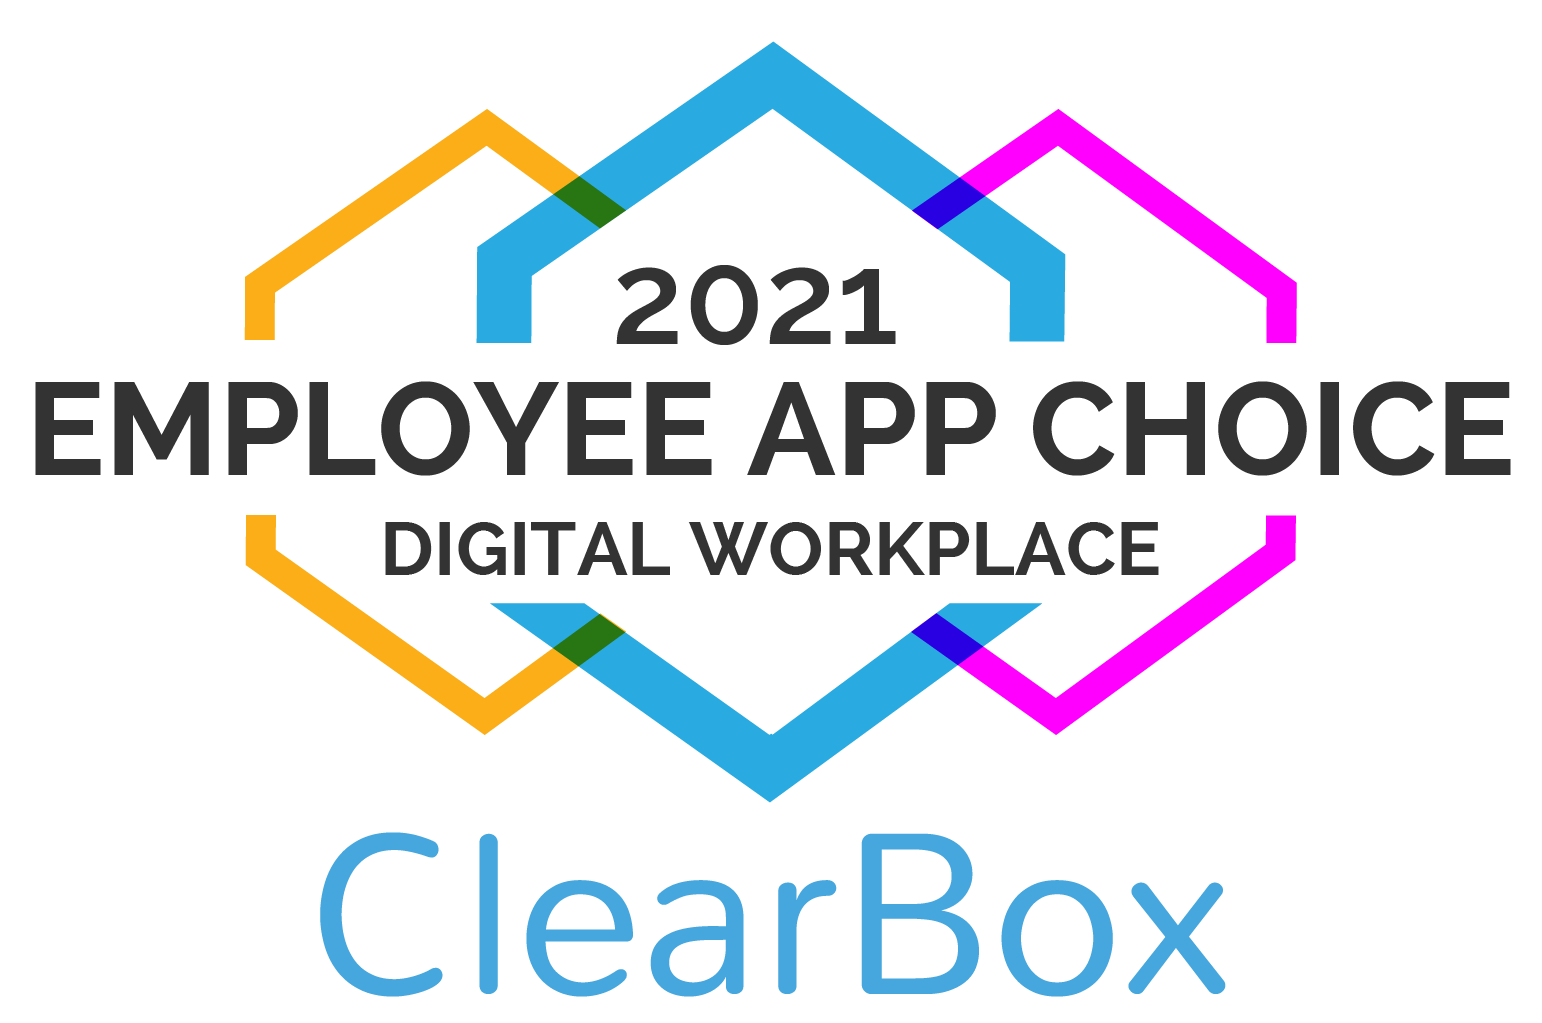 Employee app choice Digital Workplace 2021.